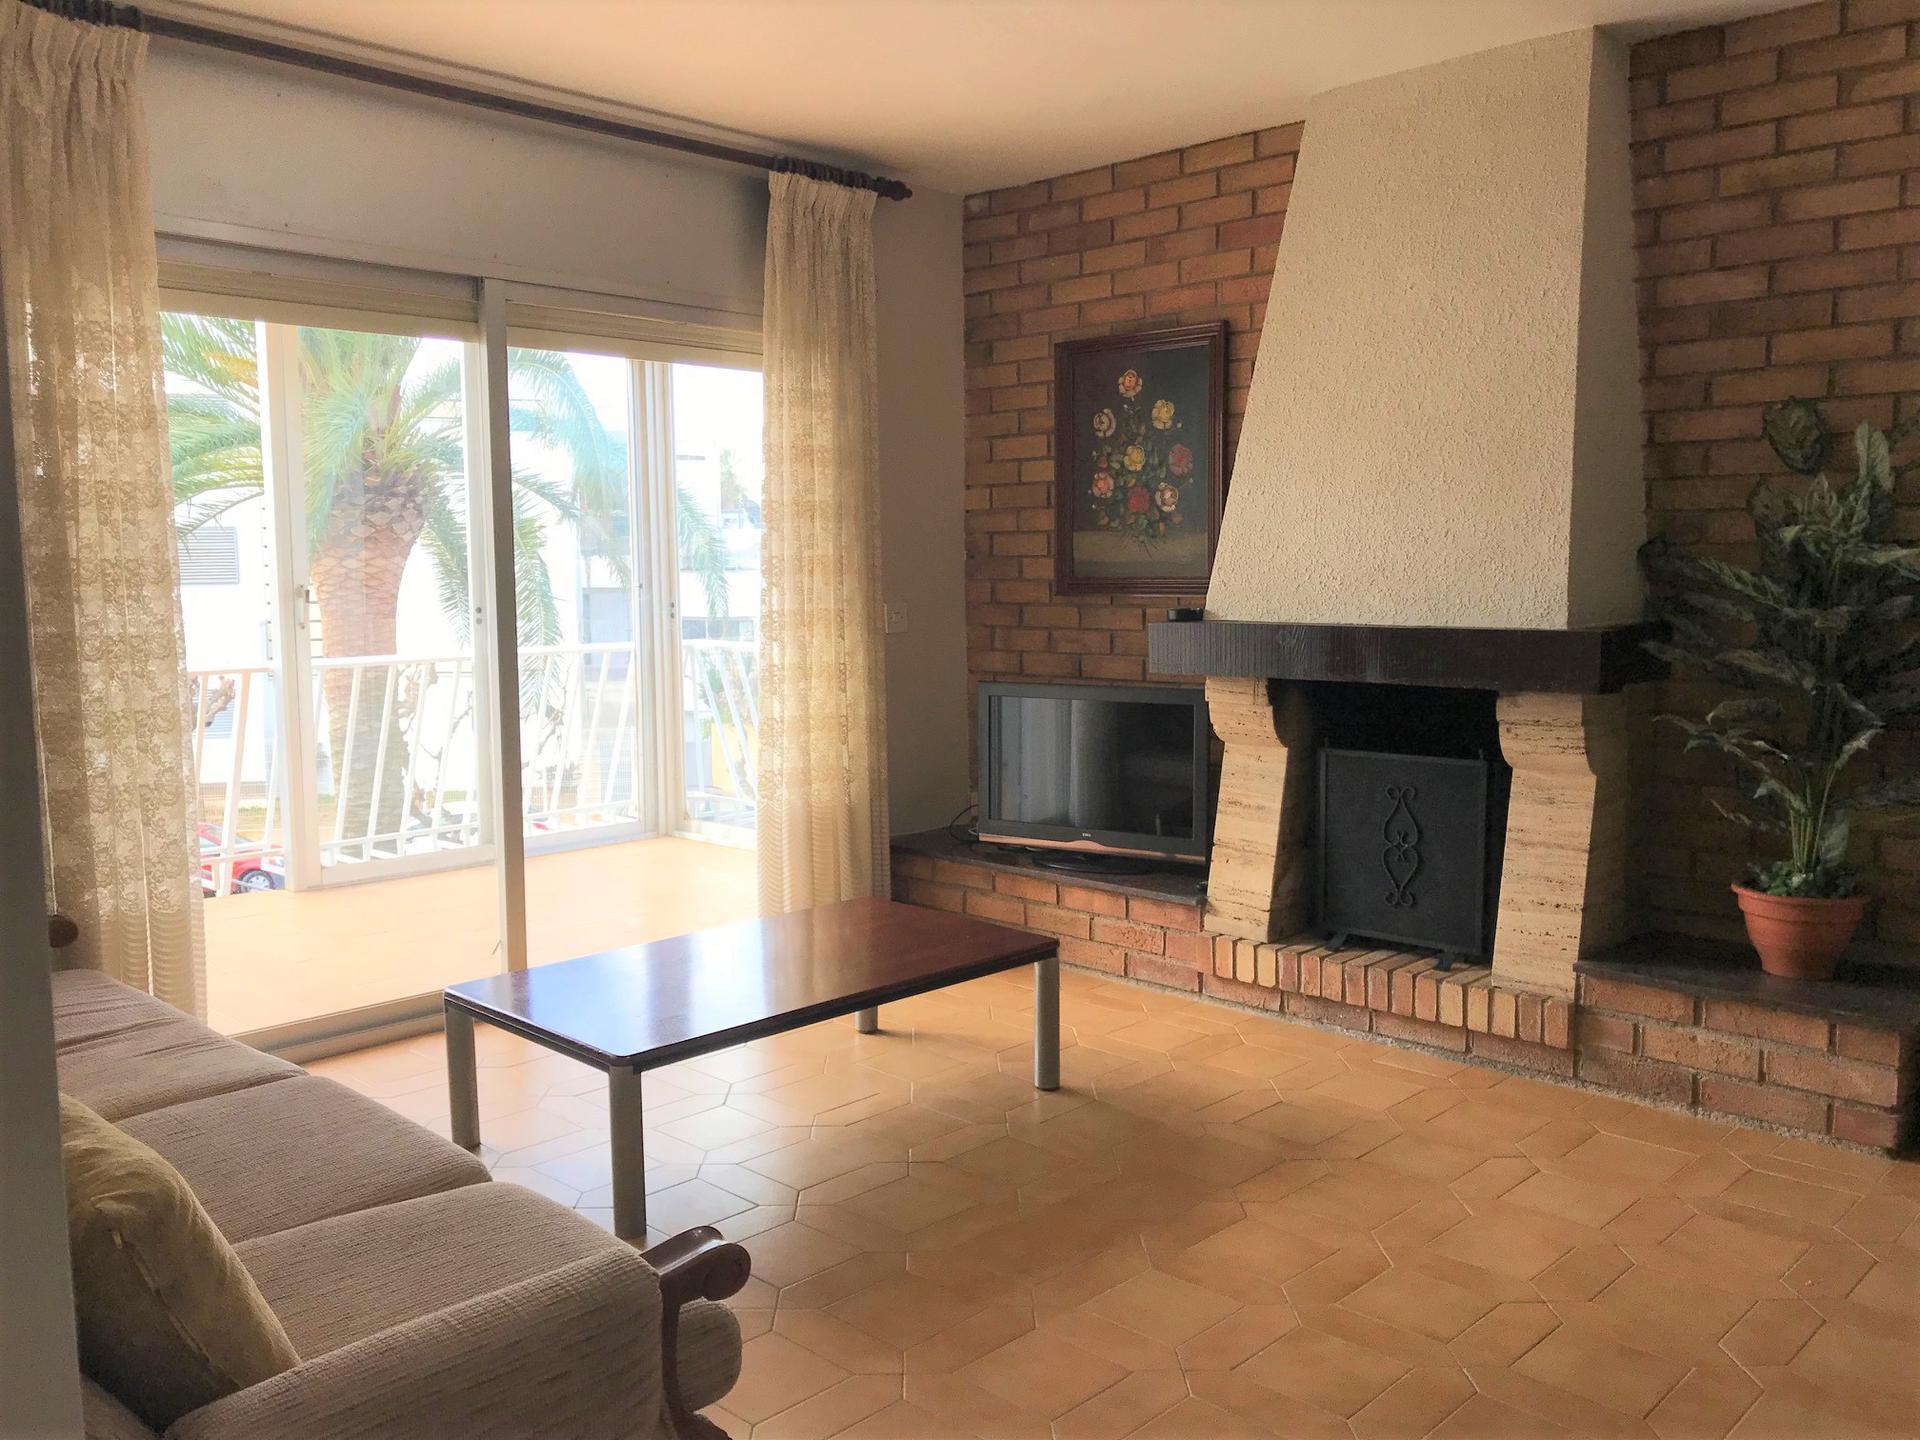 Apartamento -                                       Cambrils -                                       3 dormitorios -                                       6 ocupantes